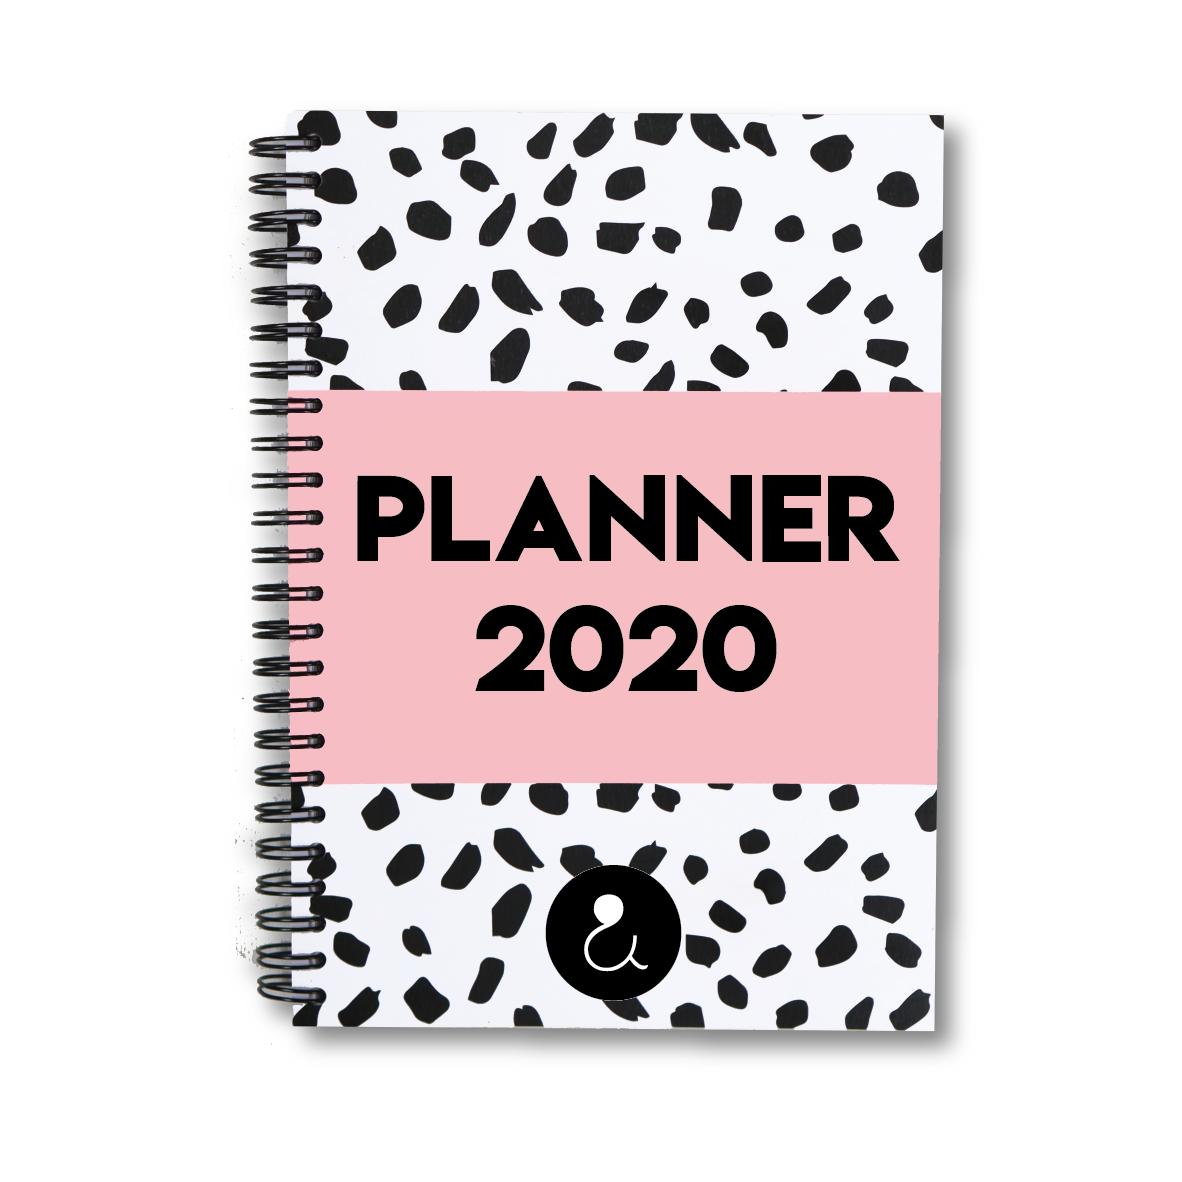 planner-2020-roze-vs_tekengebied1